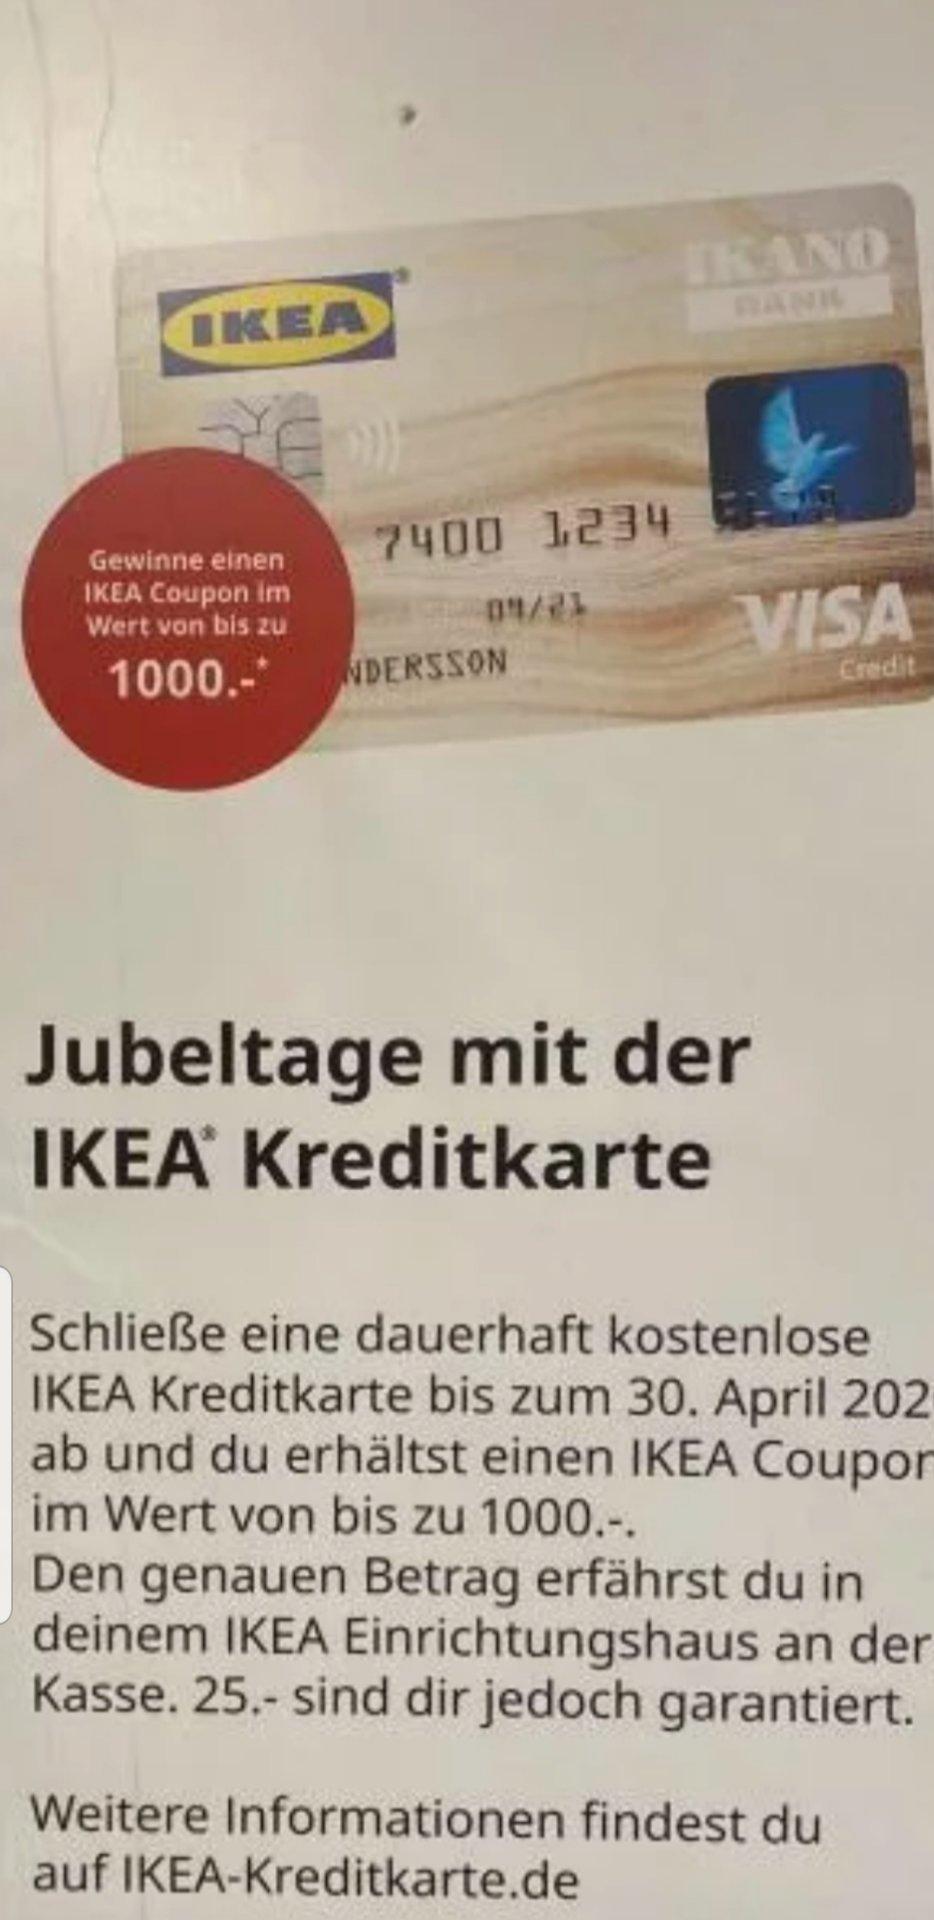 RГјckbuchung Auf Kreditkarte Dauer